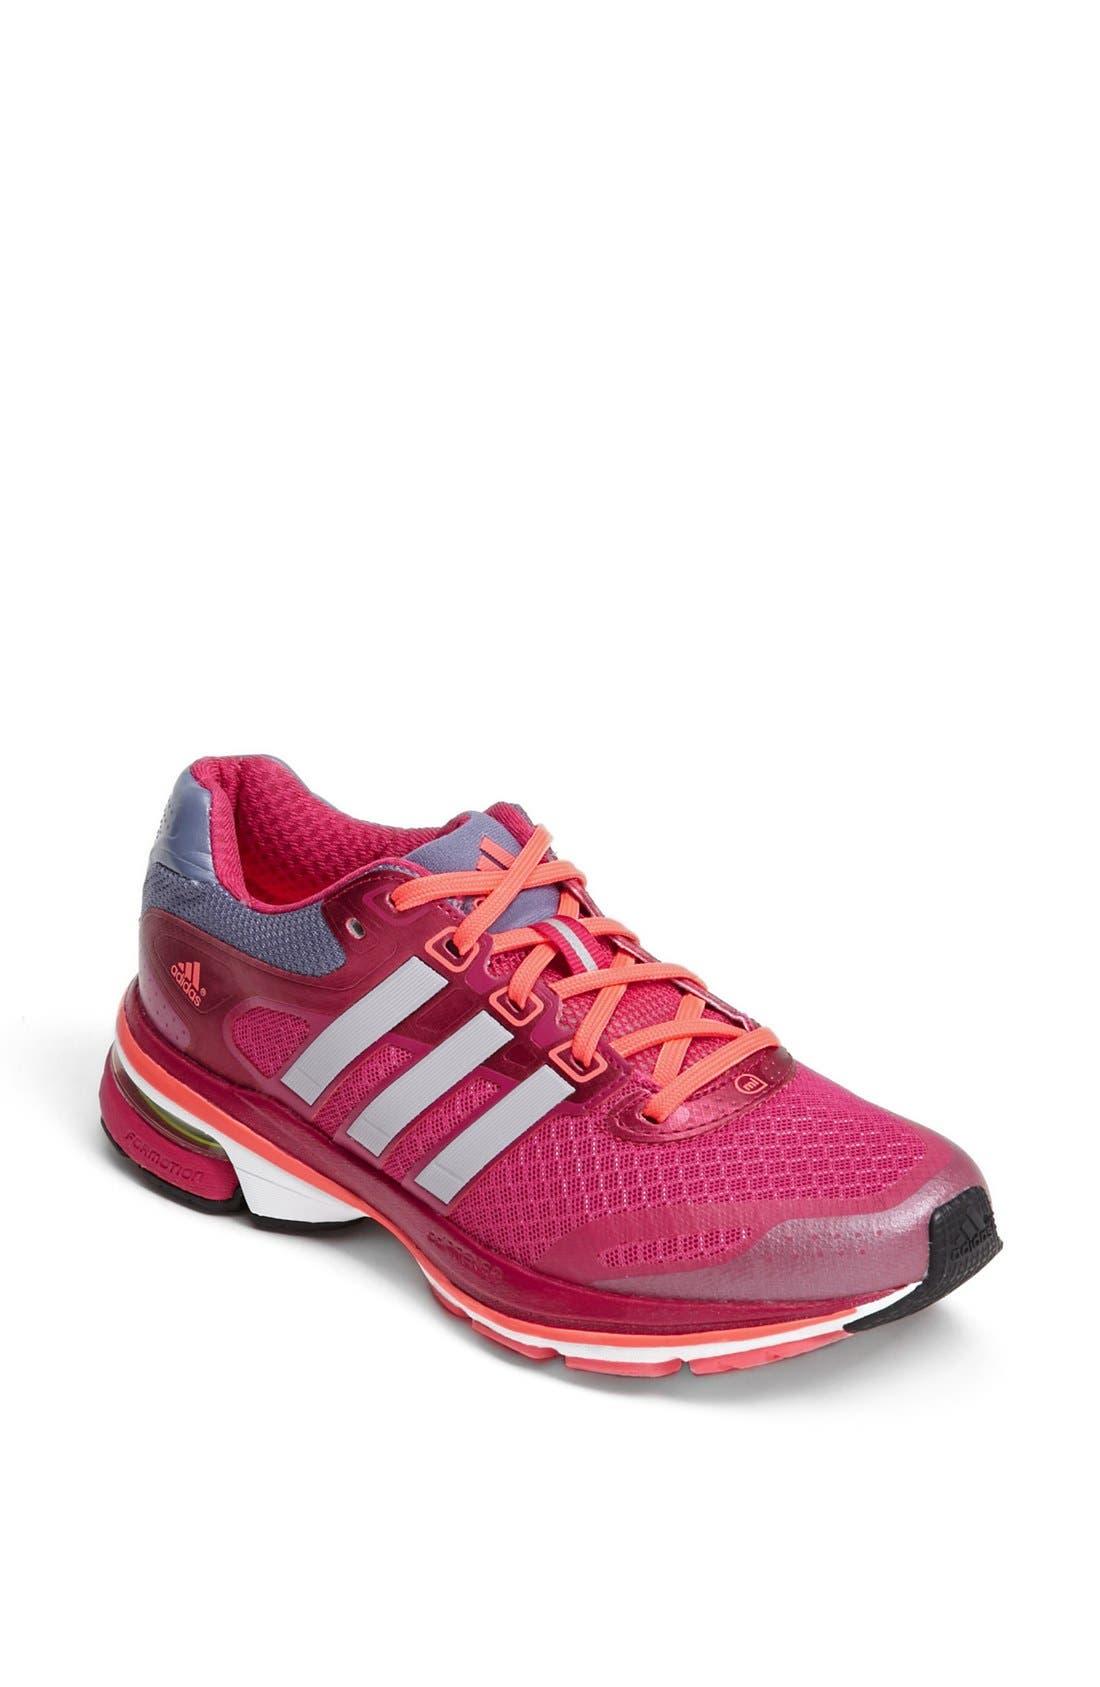 Alternate Image 1 Selected - adidas 'Supernova Glide 5' Running Shoe (Women)